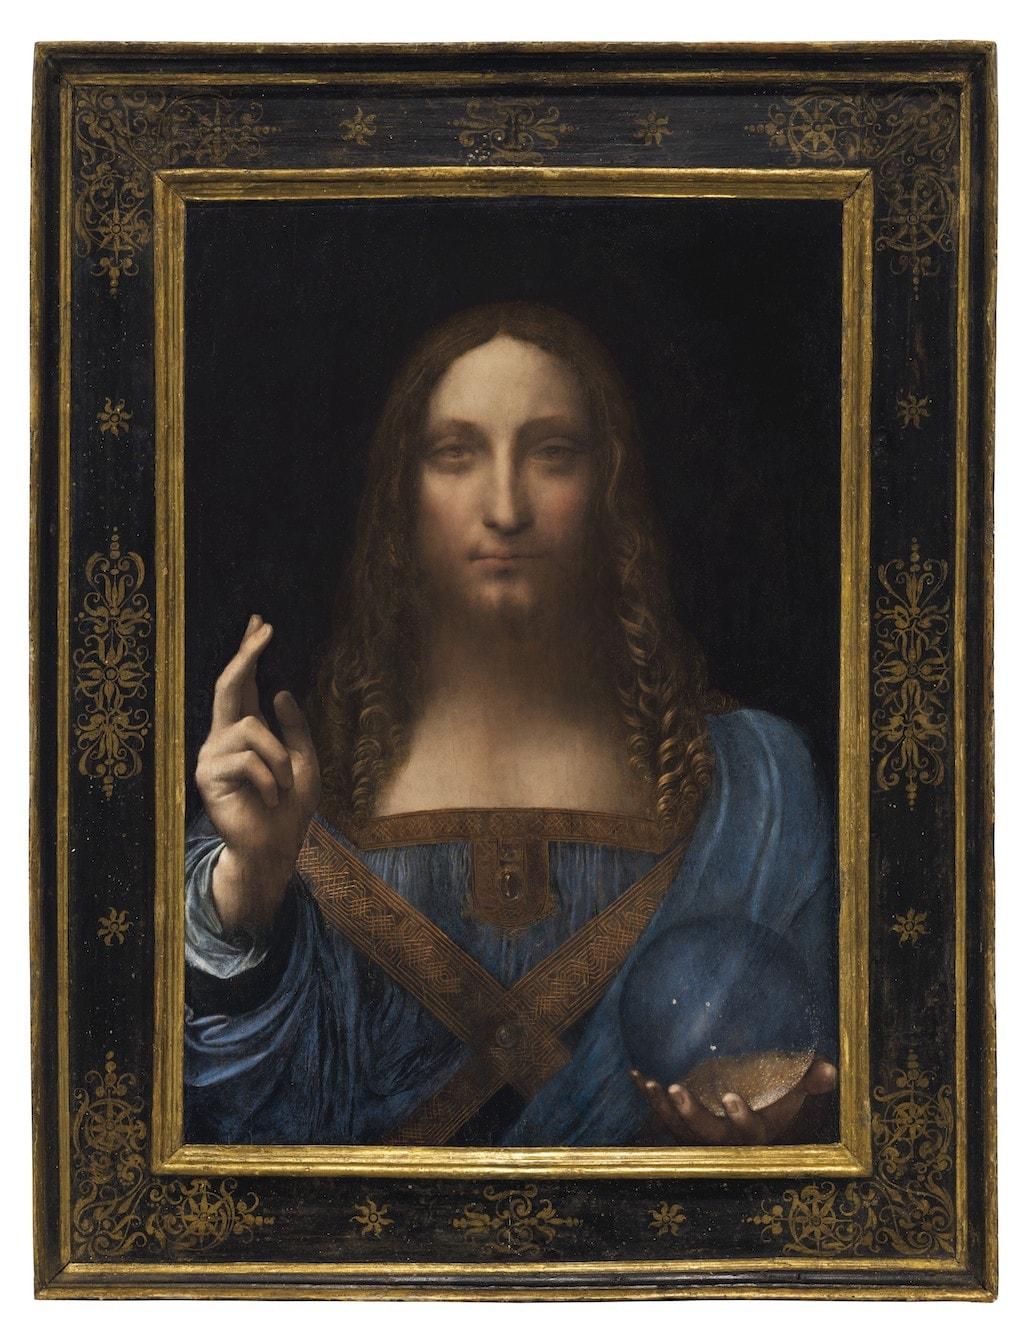 Leonardo da Vinci, Salvator Mundi, ca. 1500 | © Christie's Images Ltd.